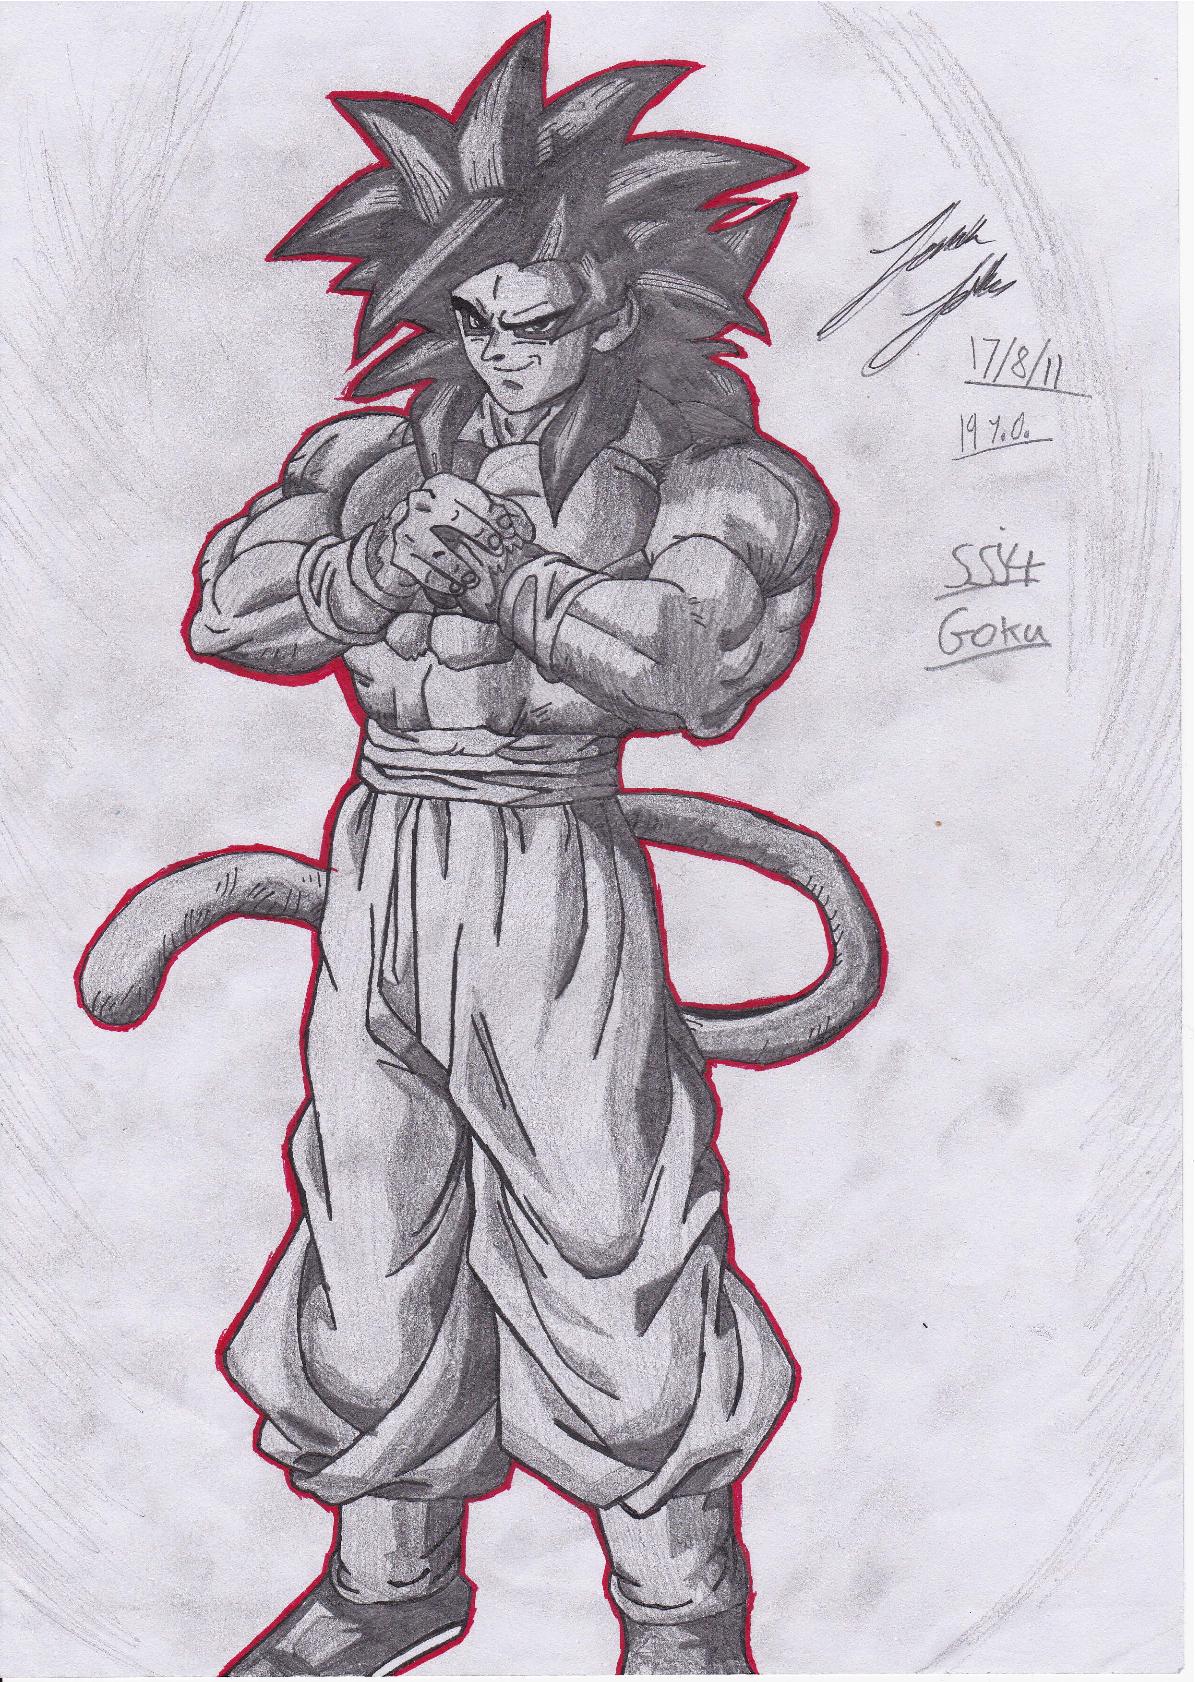 Super Saiyan 4 Goku